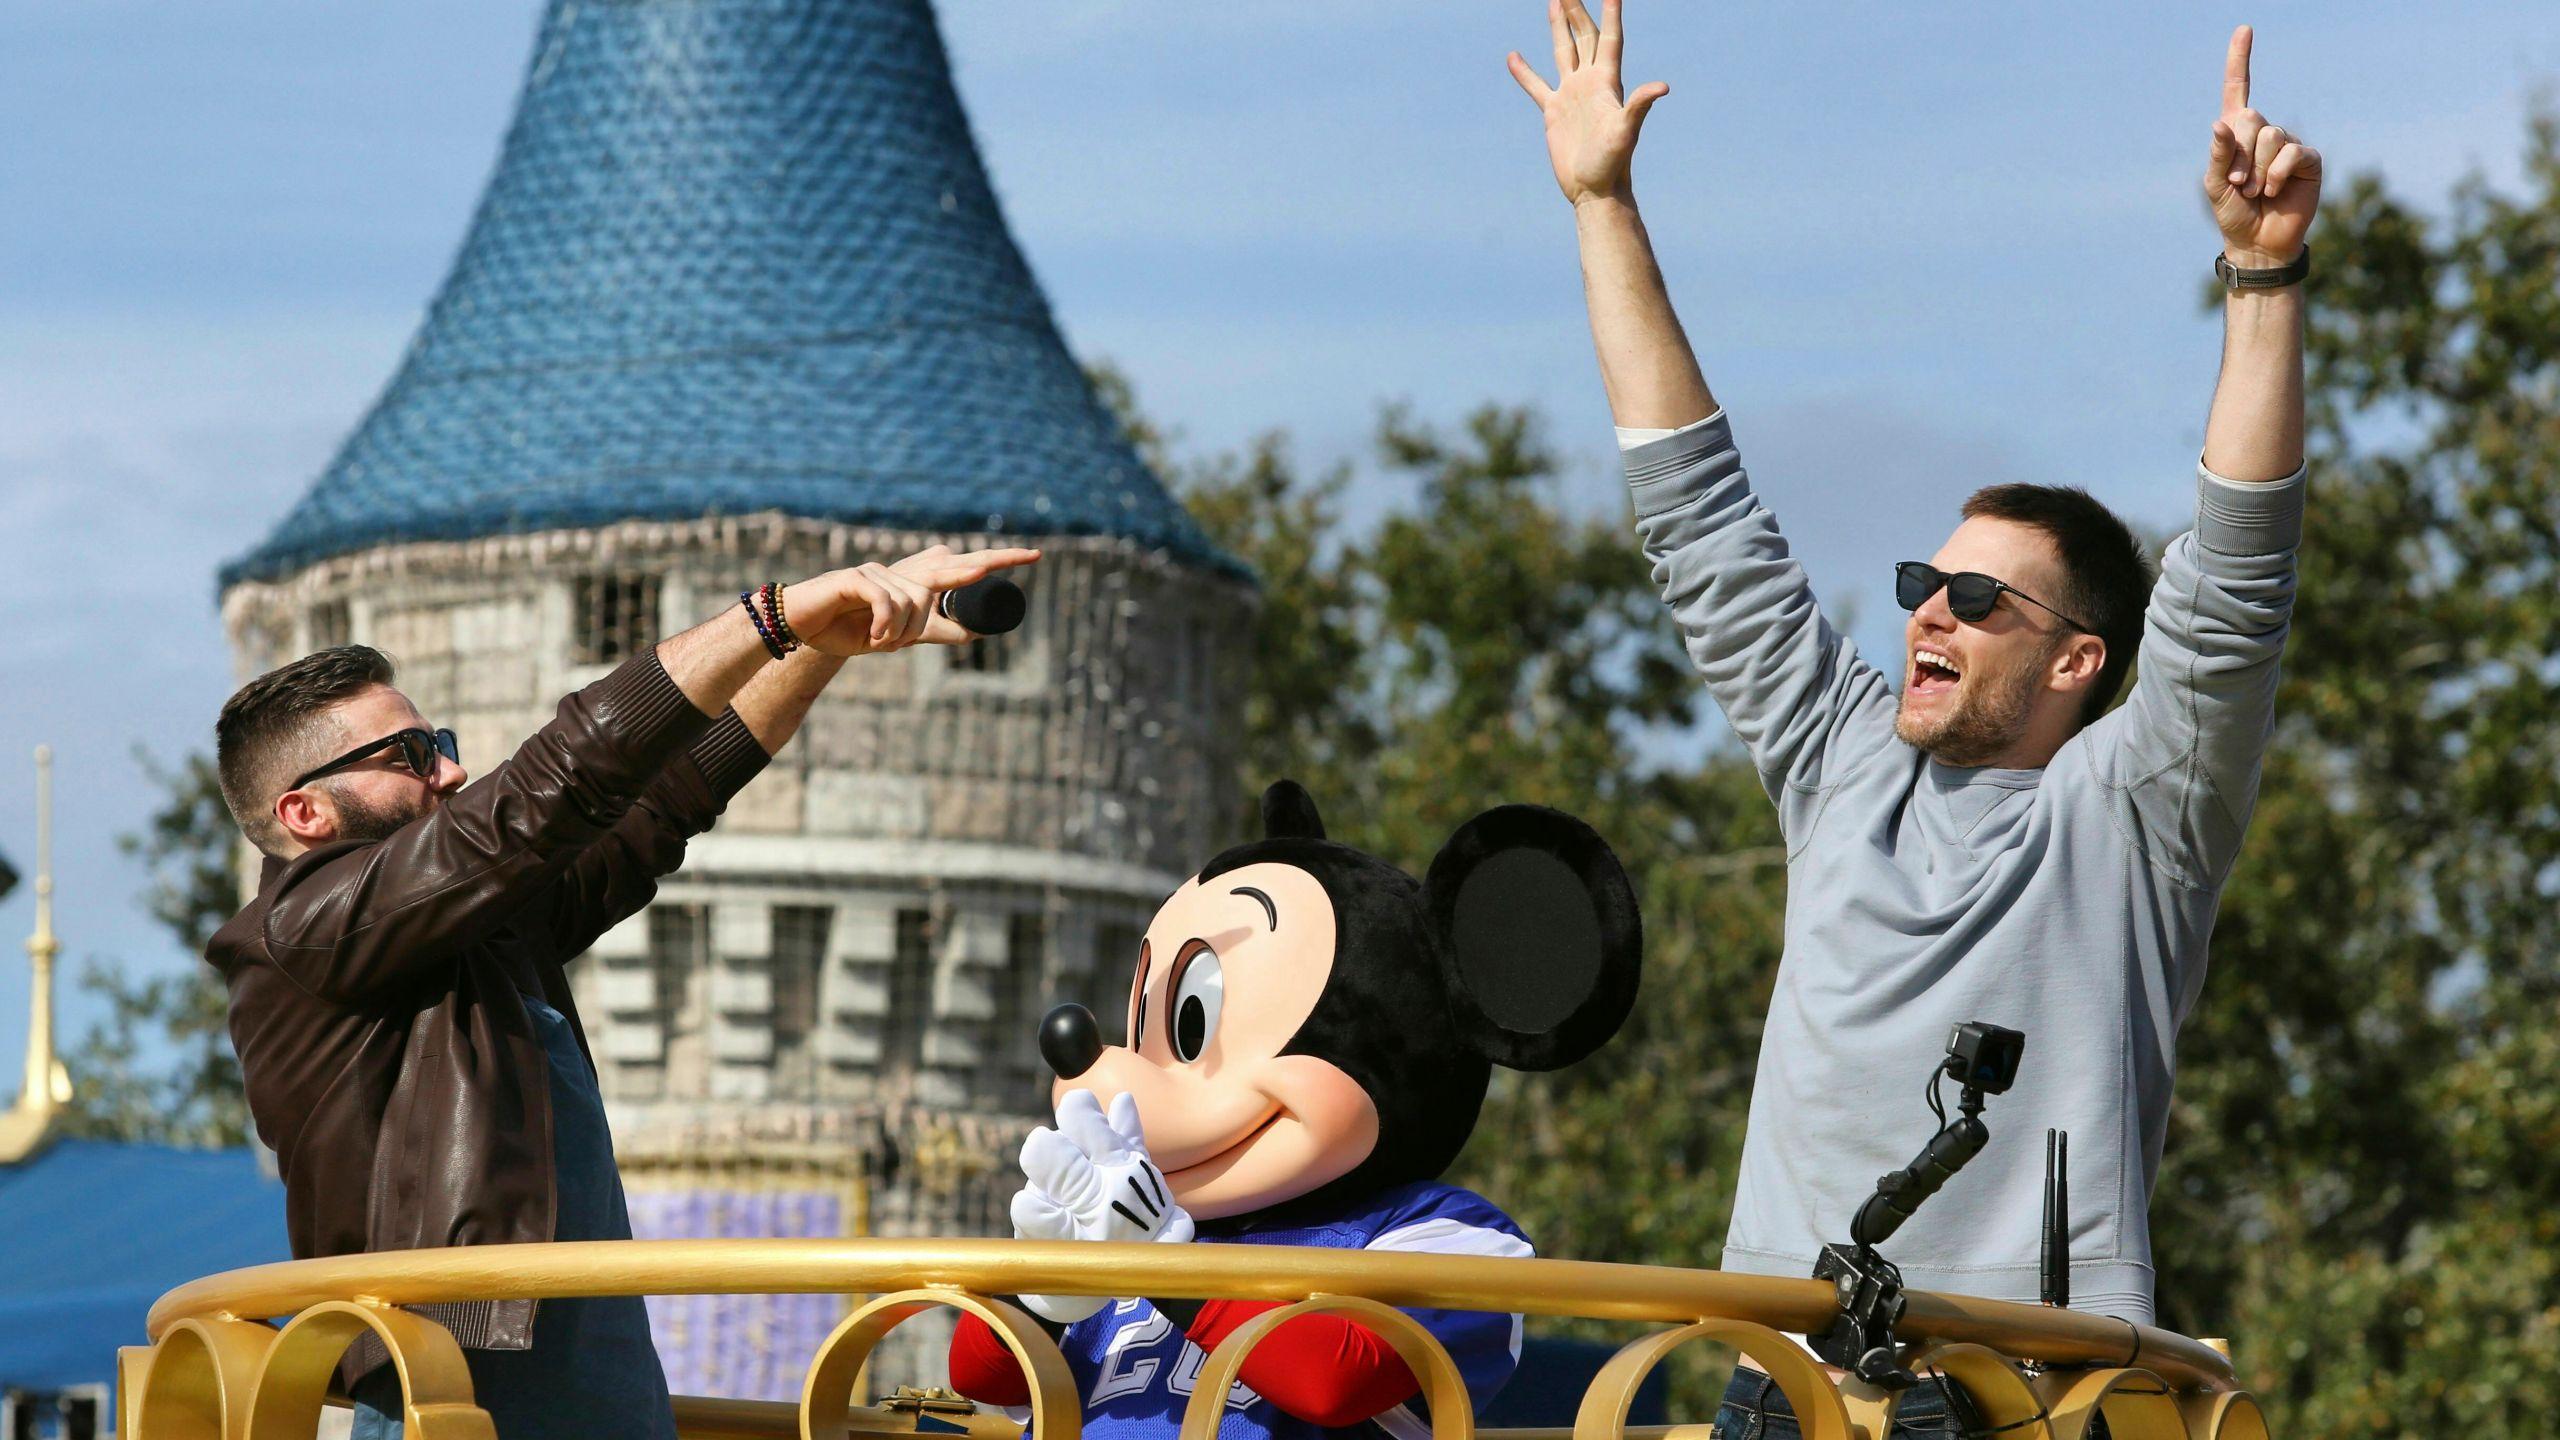 Super_Bowl_victory_parade_at_Walt_Disney_World_11915-159532.jpg63549201